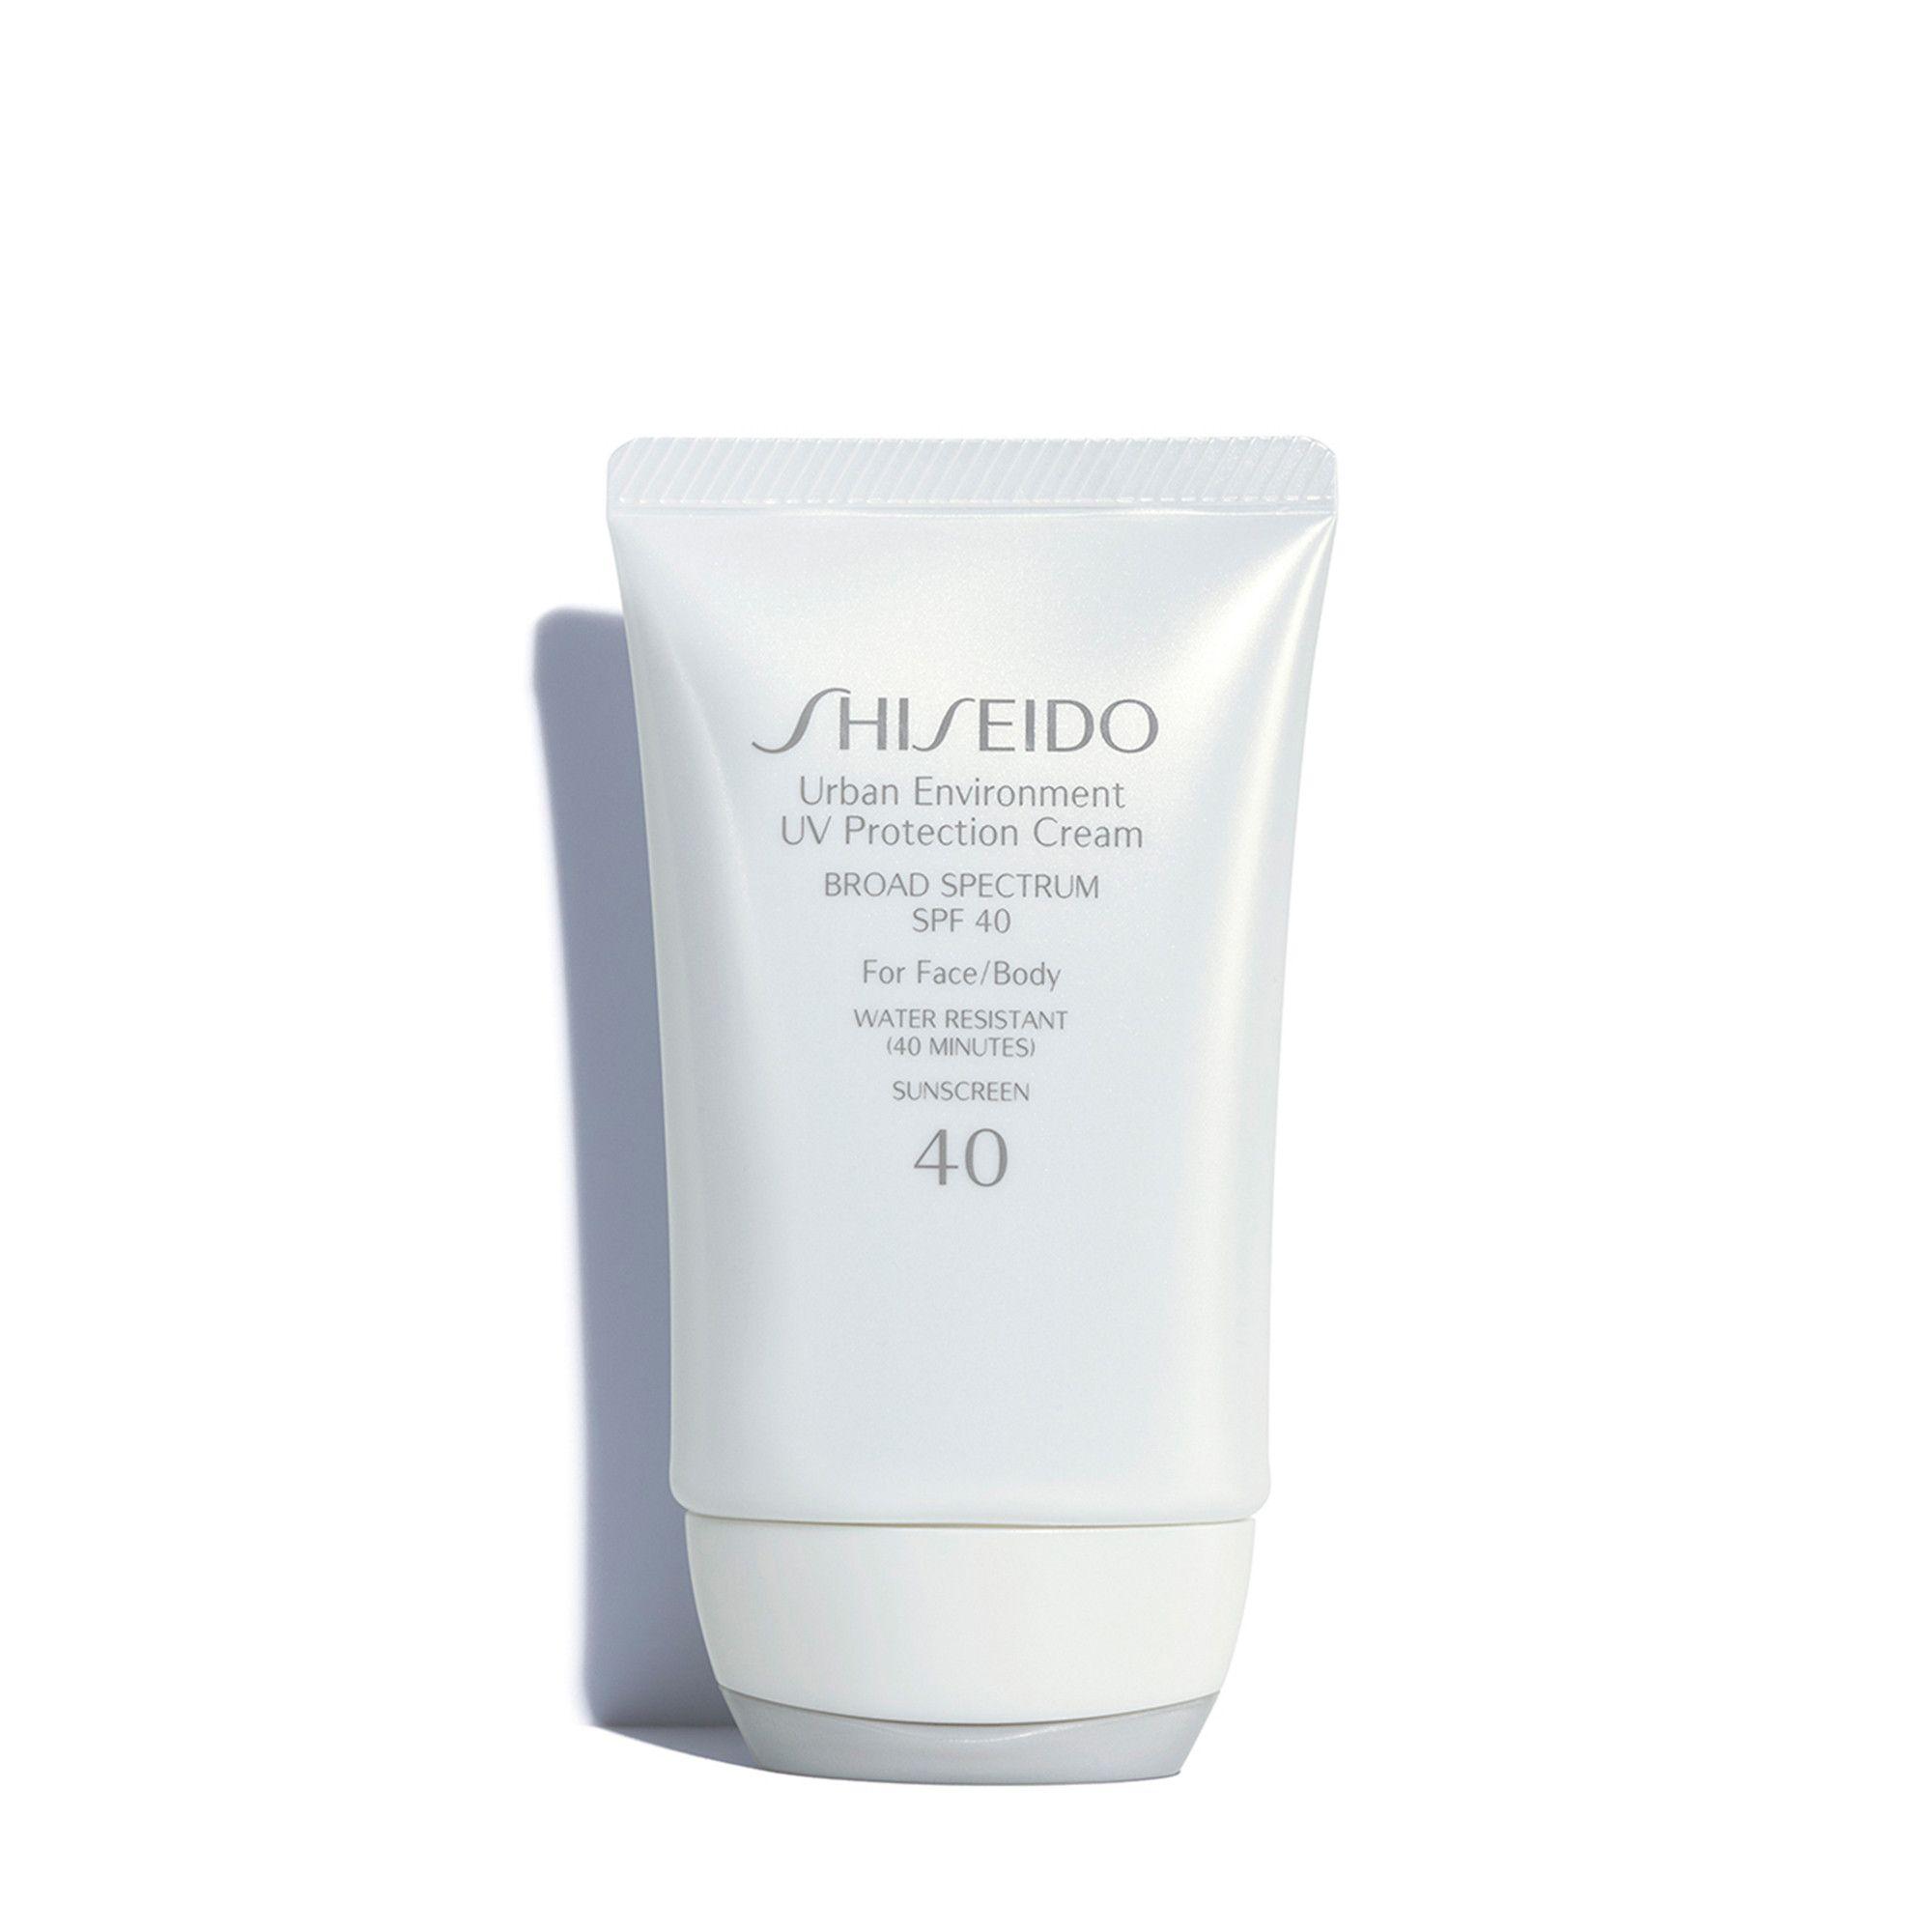 Urban Environment Uv Protection Cream Spf 40 Sunscreen Shiseido Daily Sunscreen Sunscreen Uv Protection